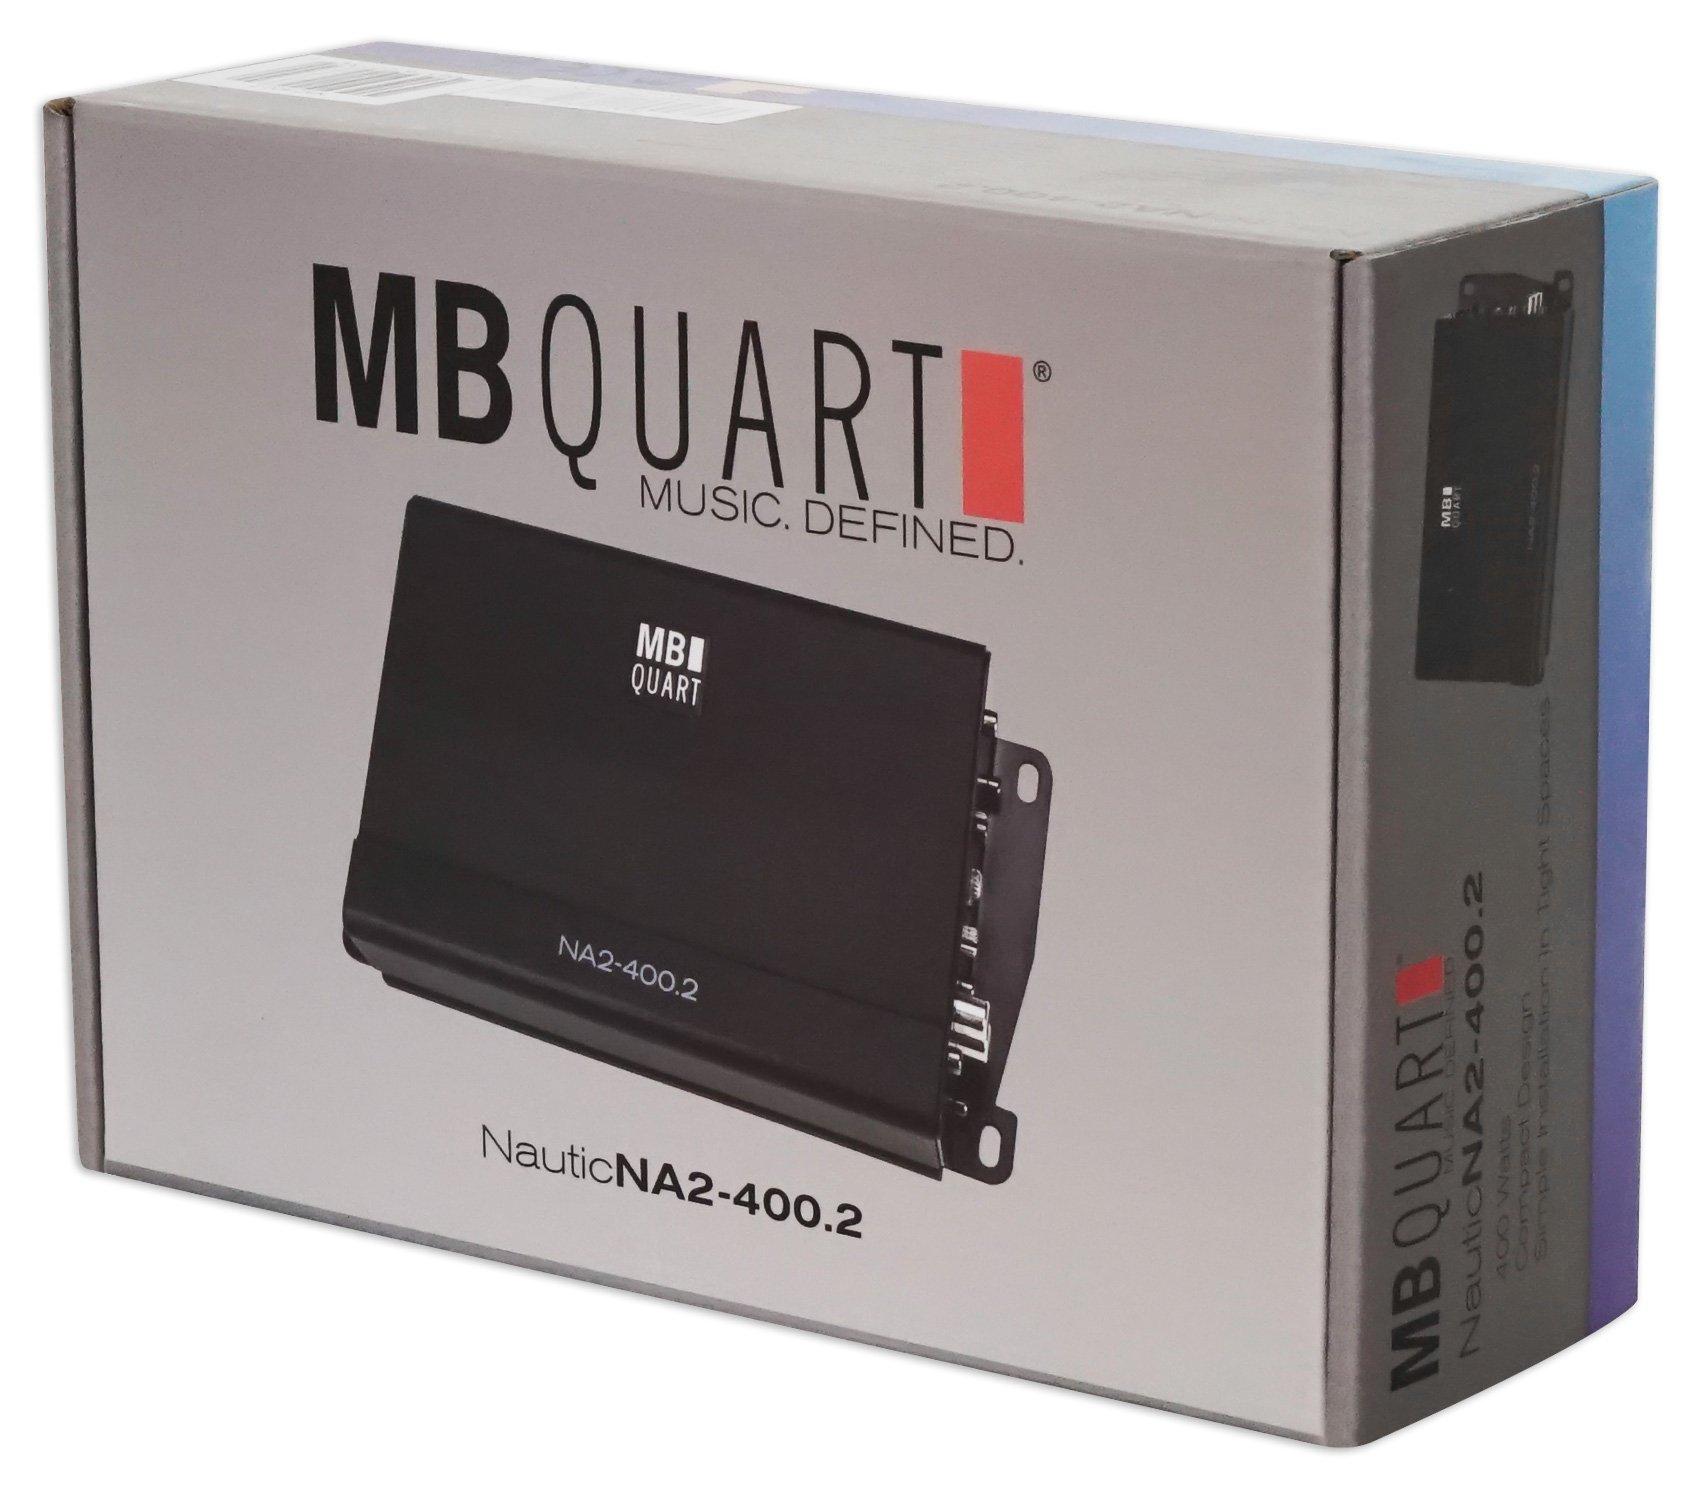 MB QUART NA2-400.2 400w 2-Channel Amplifier Amp For Polaris/ATV/UTV/RZR/CART by MB Quart (Image #9)